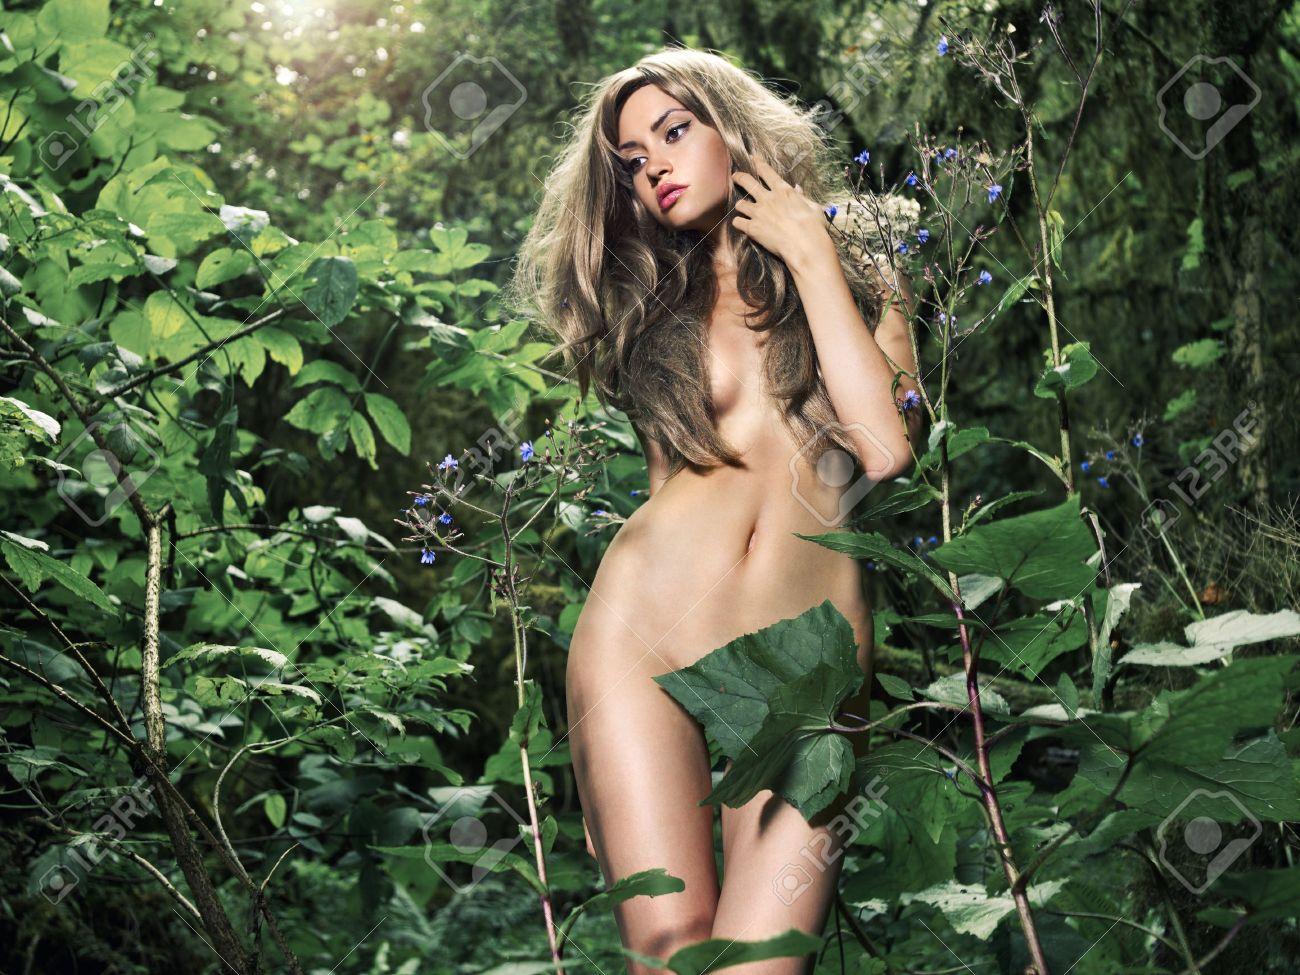 Шлюхи булонского леса 24 фотография